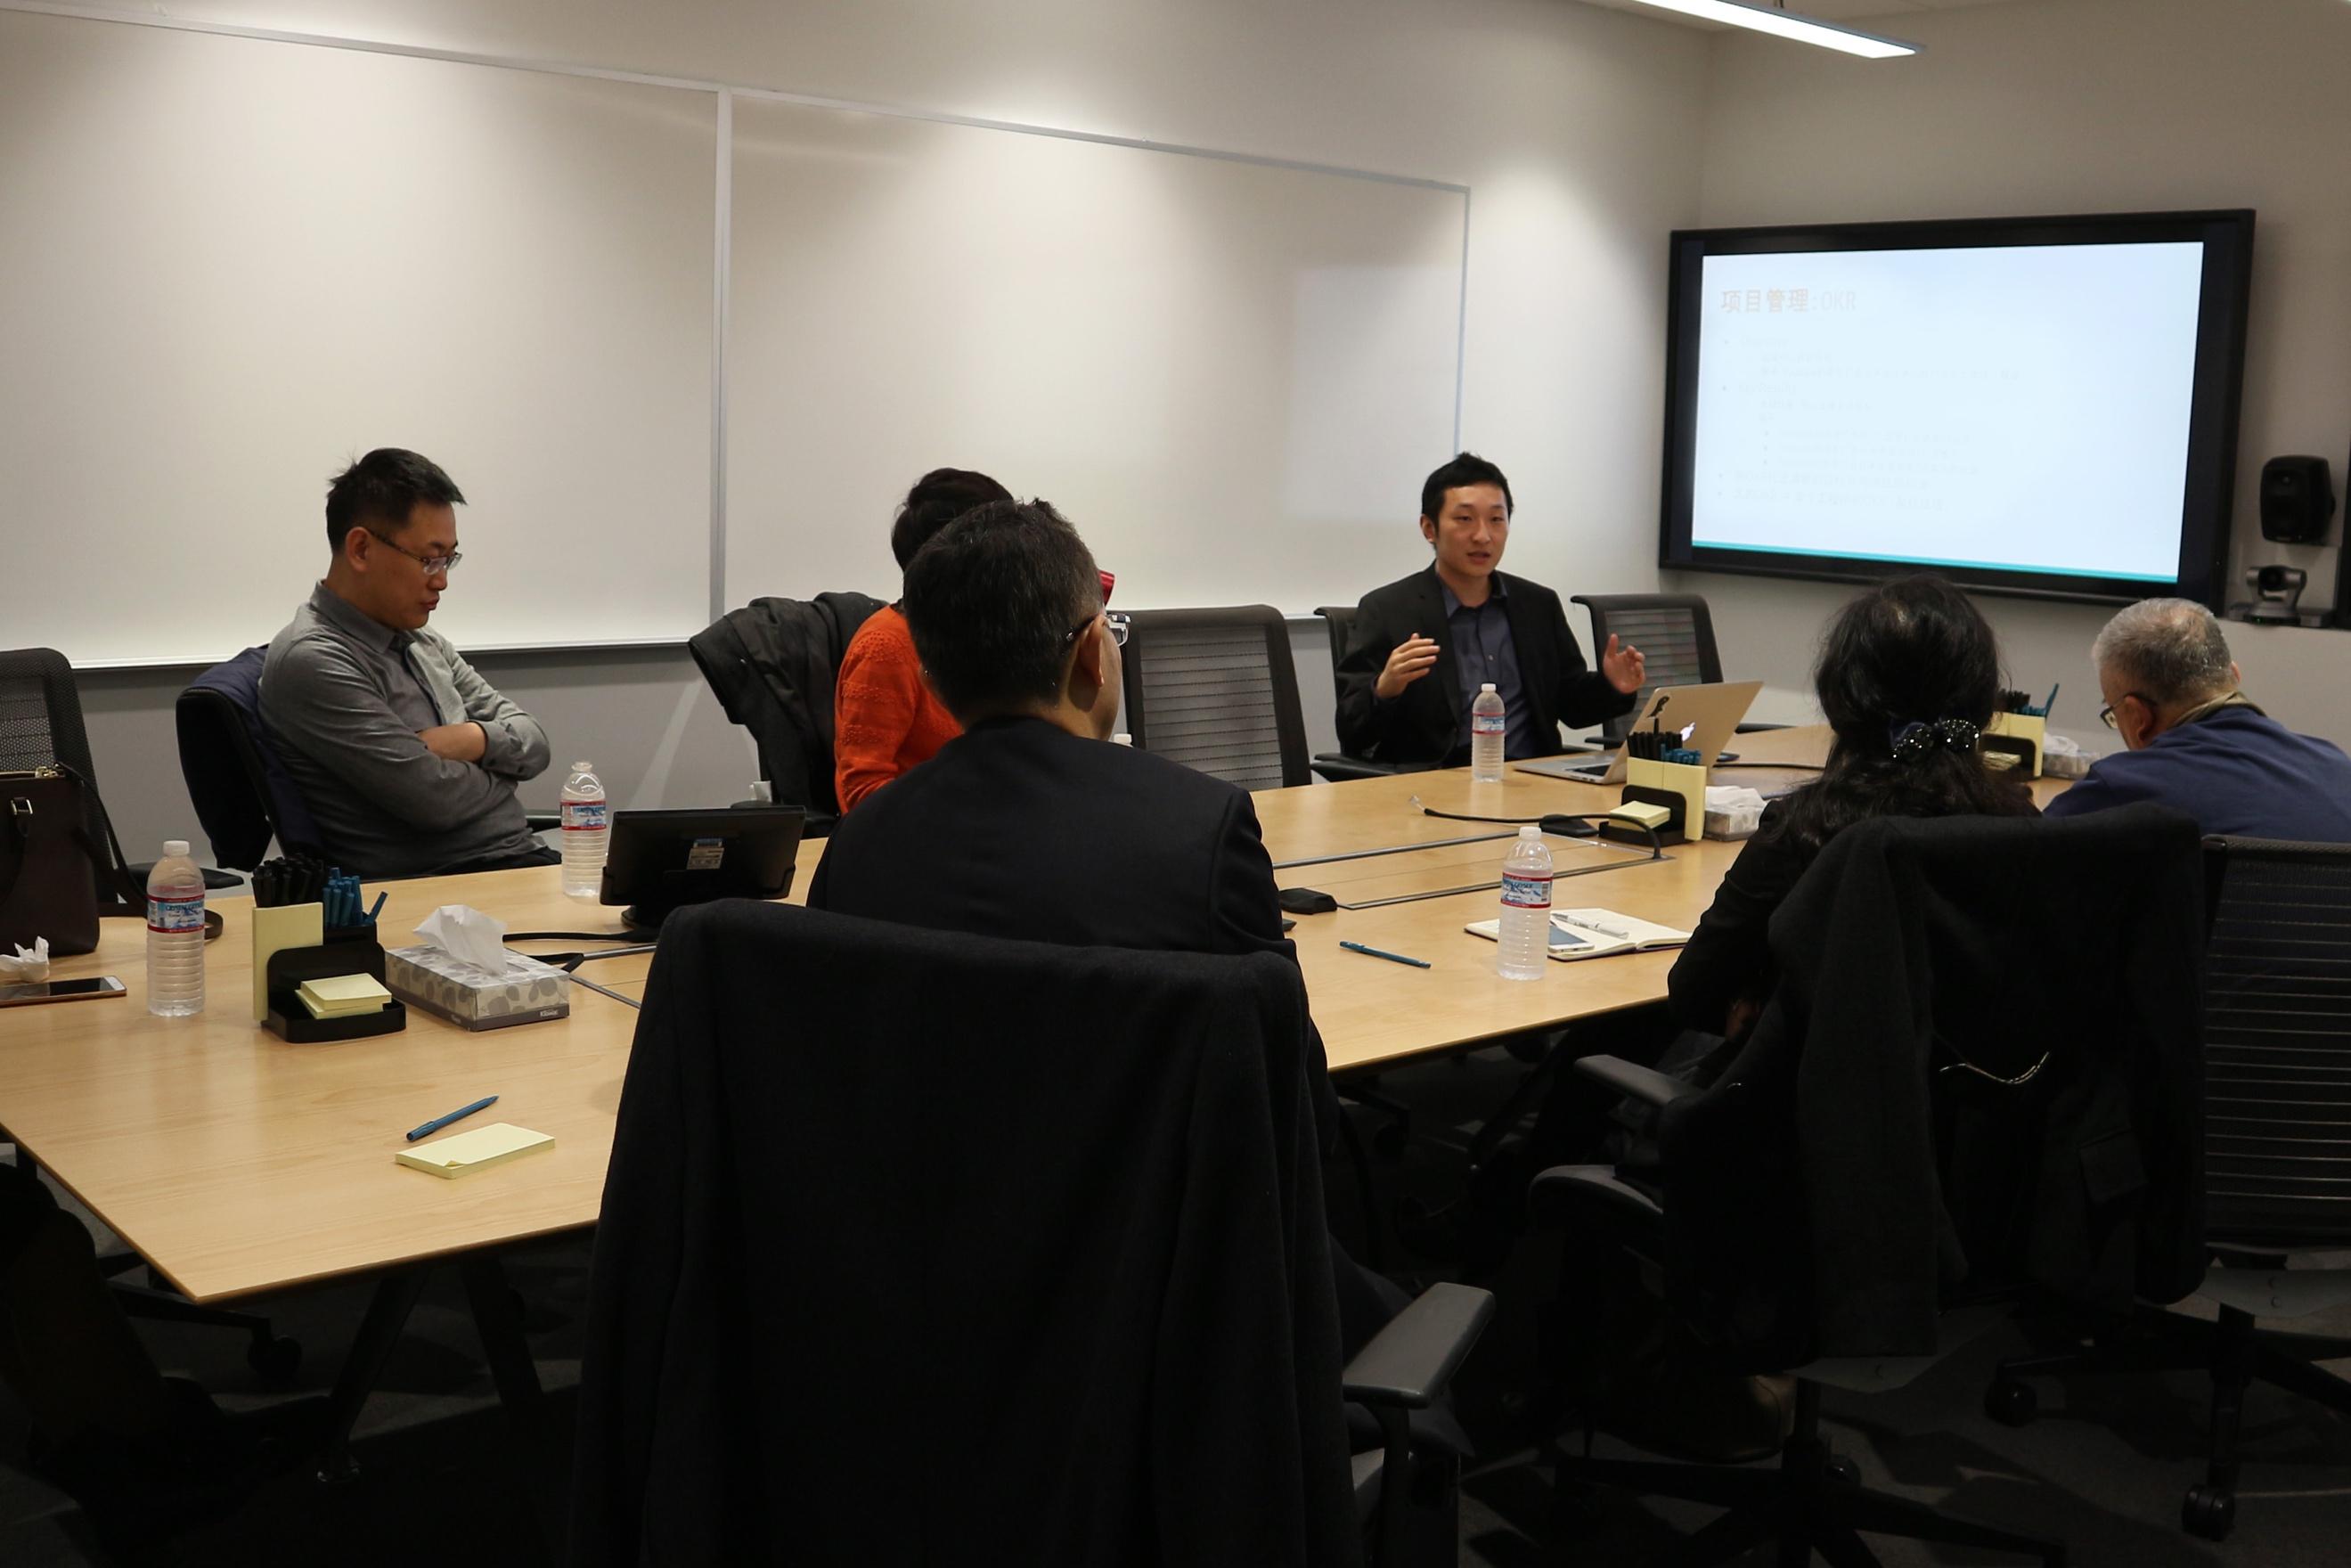 Google人工智能研发团队高管Luo博士深入介绍和交流